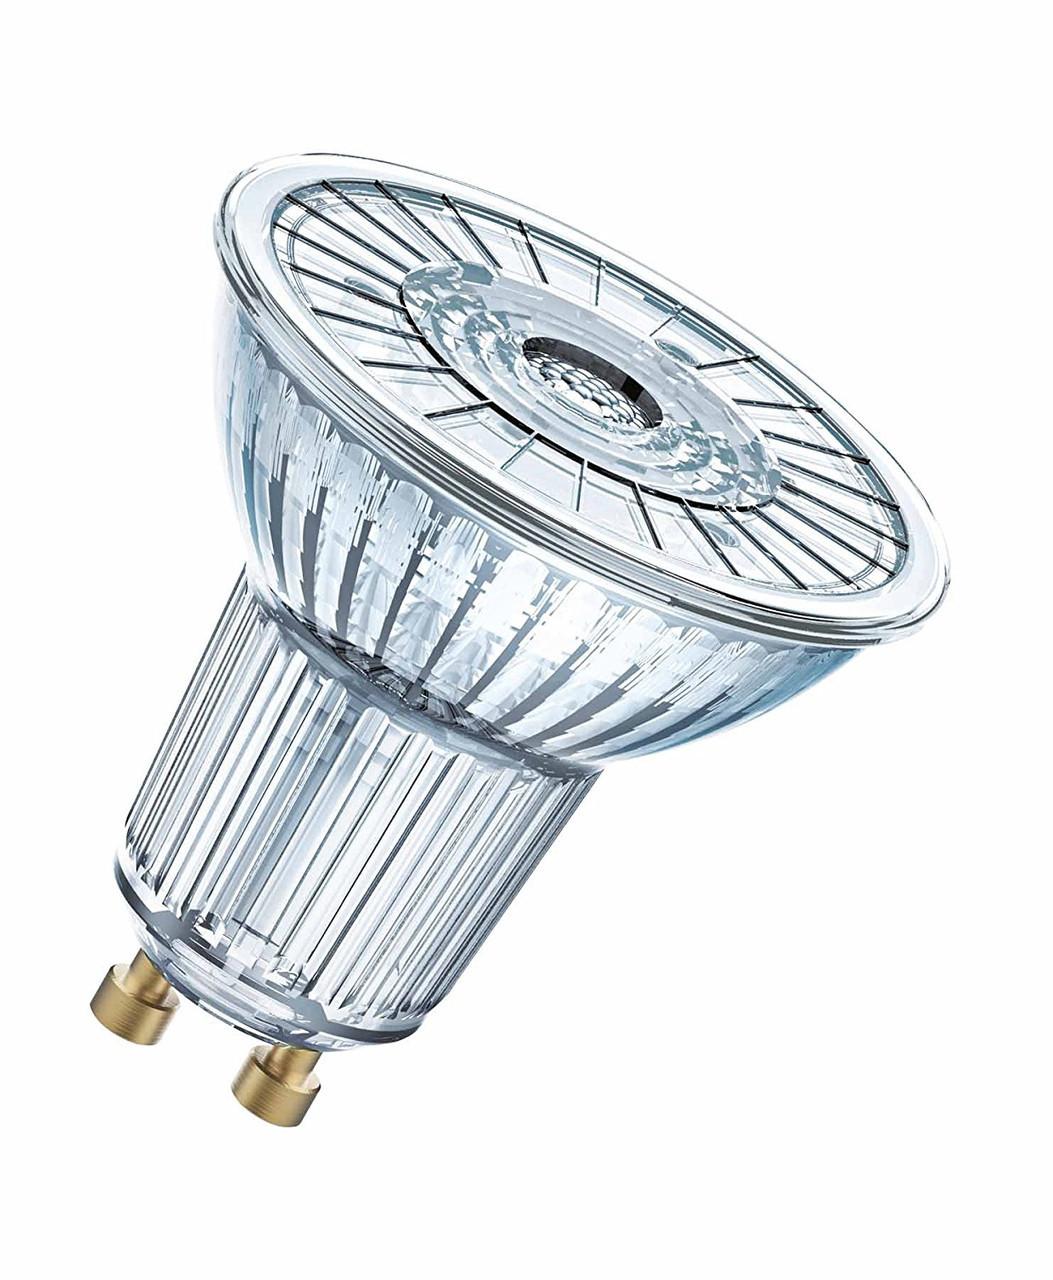 Лампа LED SUPERSTAR PAR16 35 36° ADV 3,1 W 2700К GU10 OSRAM диммируемая